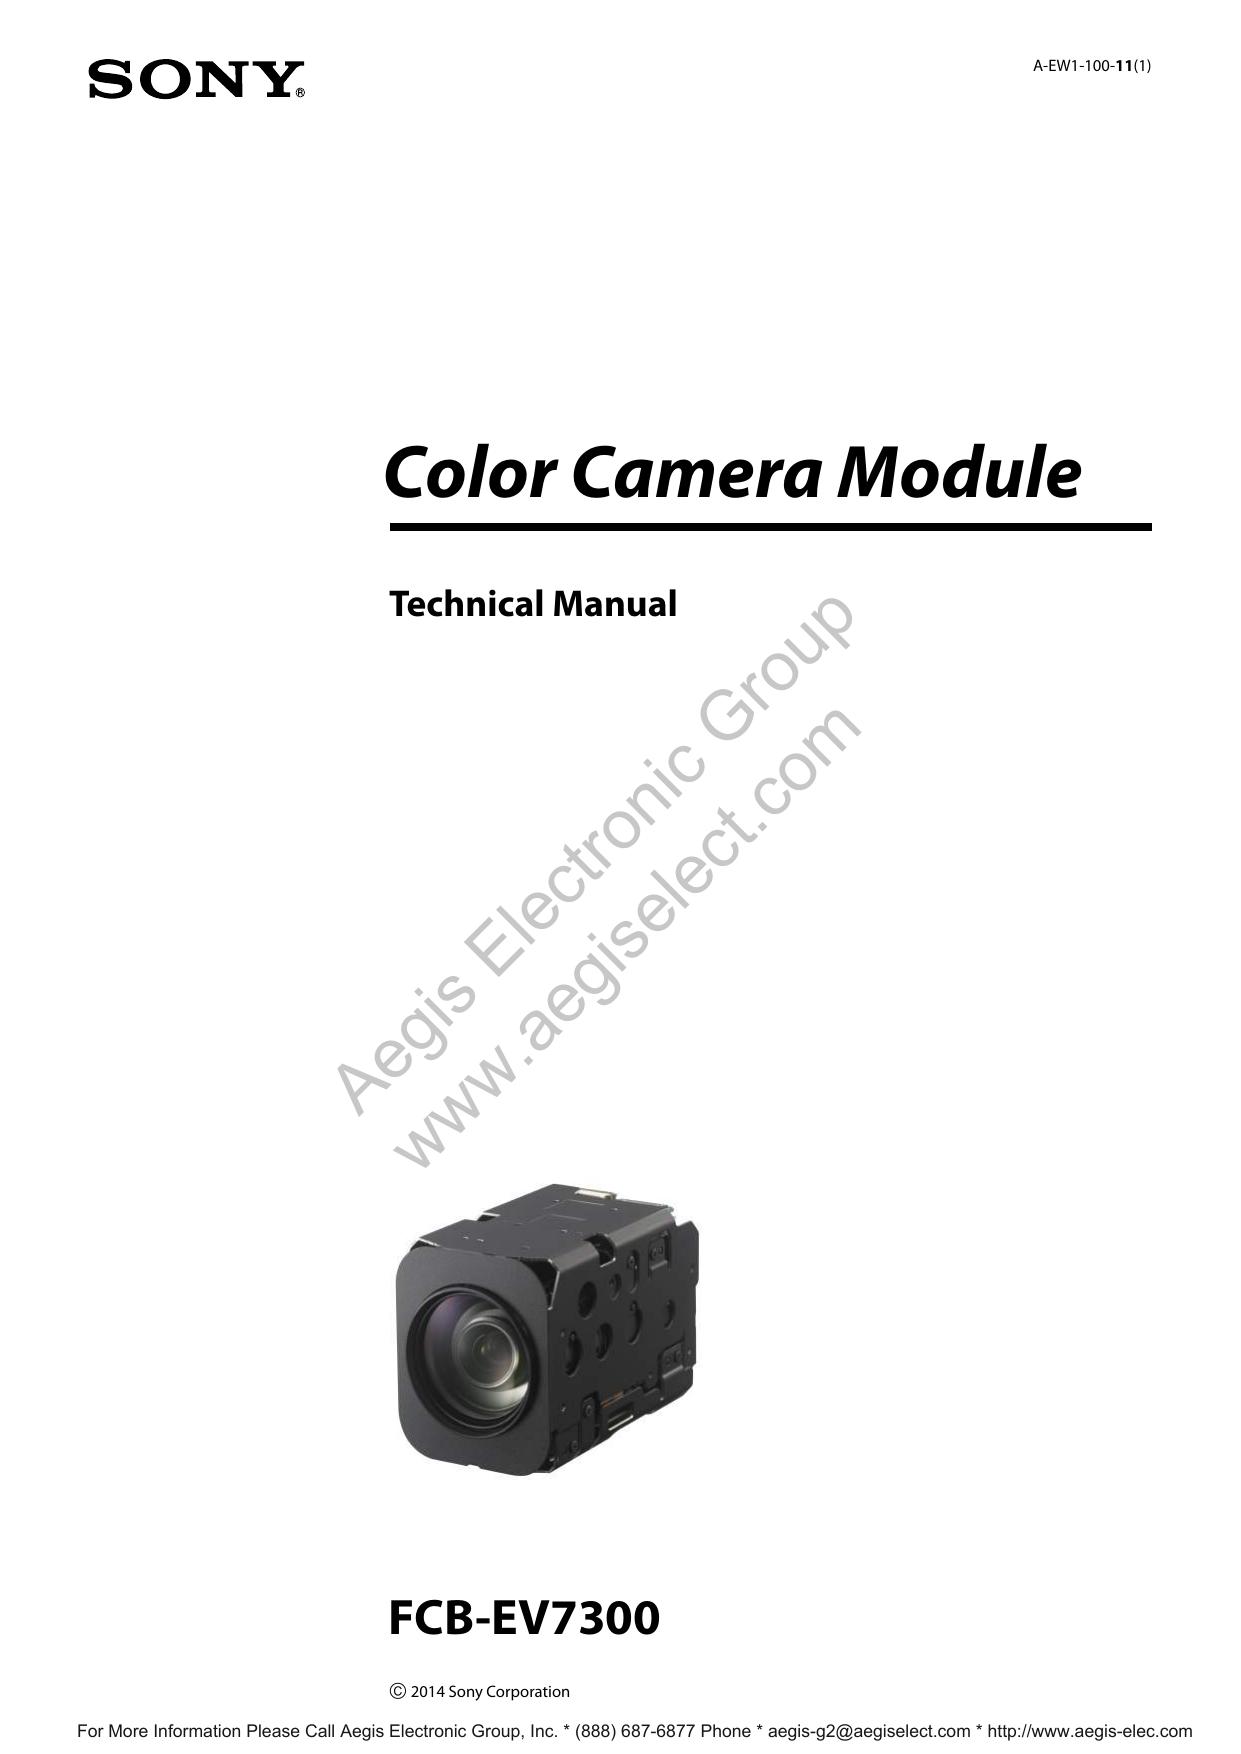 Sony FCB-EV7300 Technical Manual | manualzz com